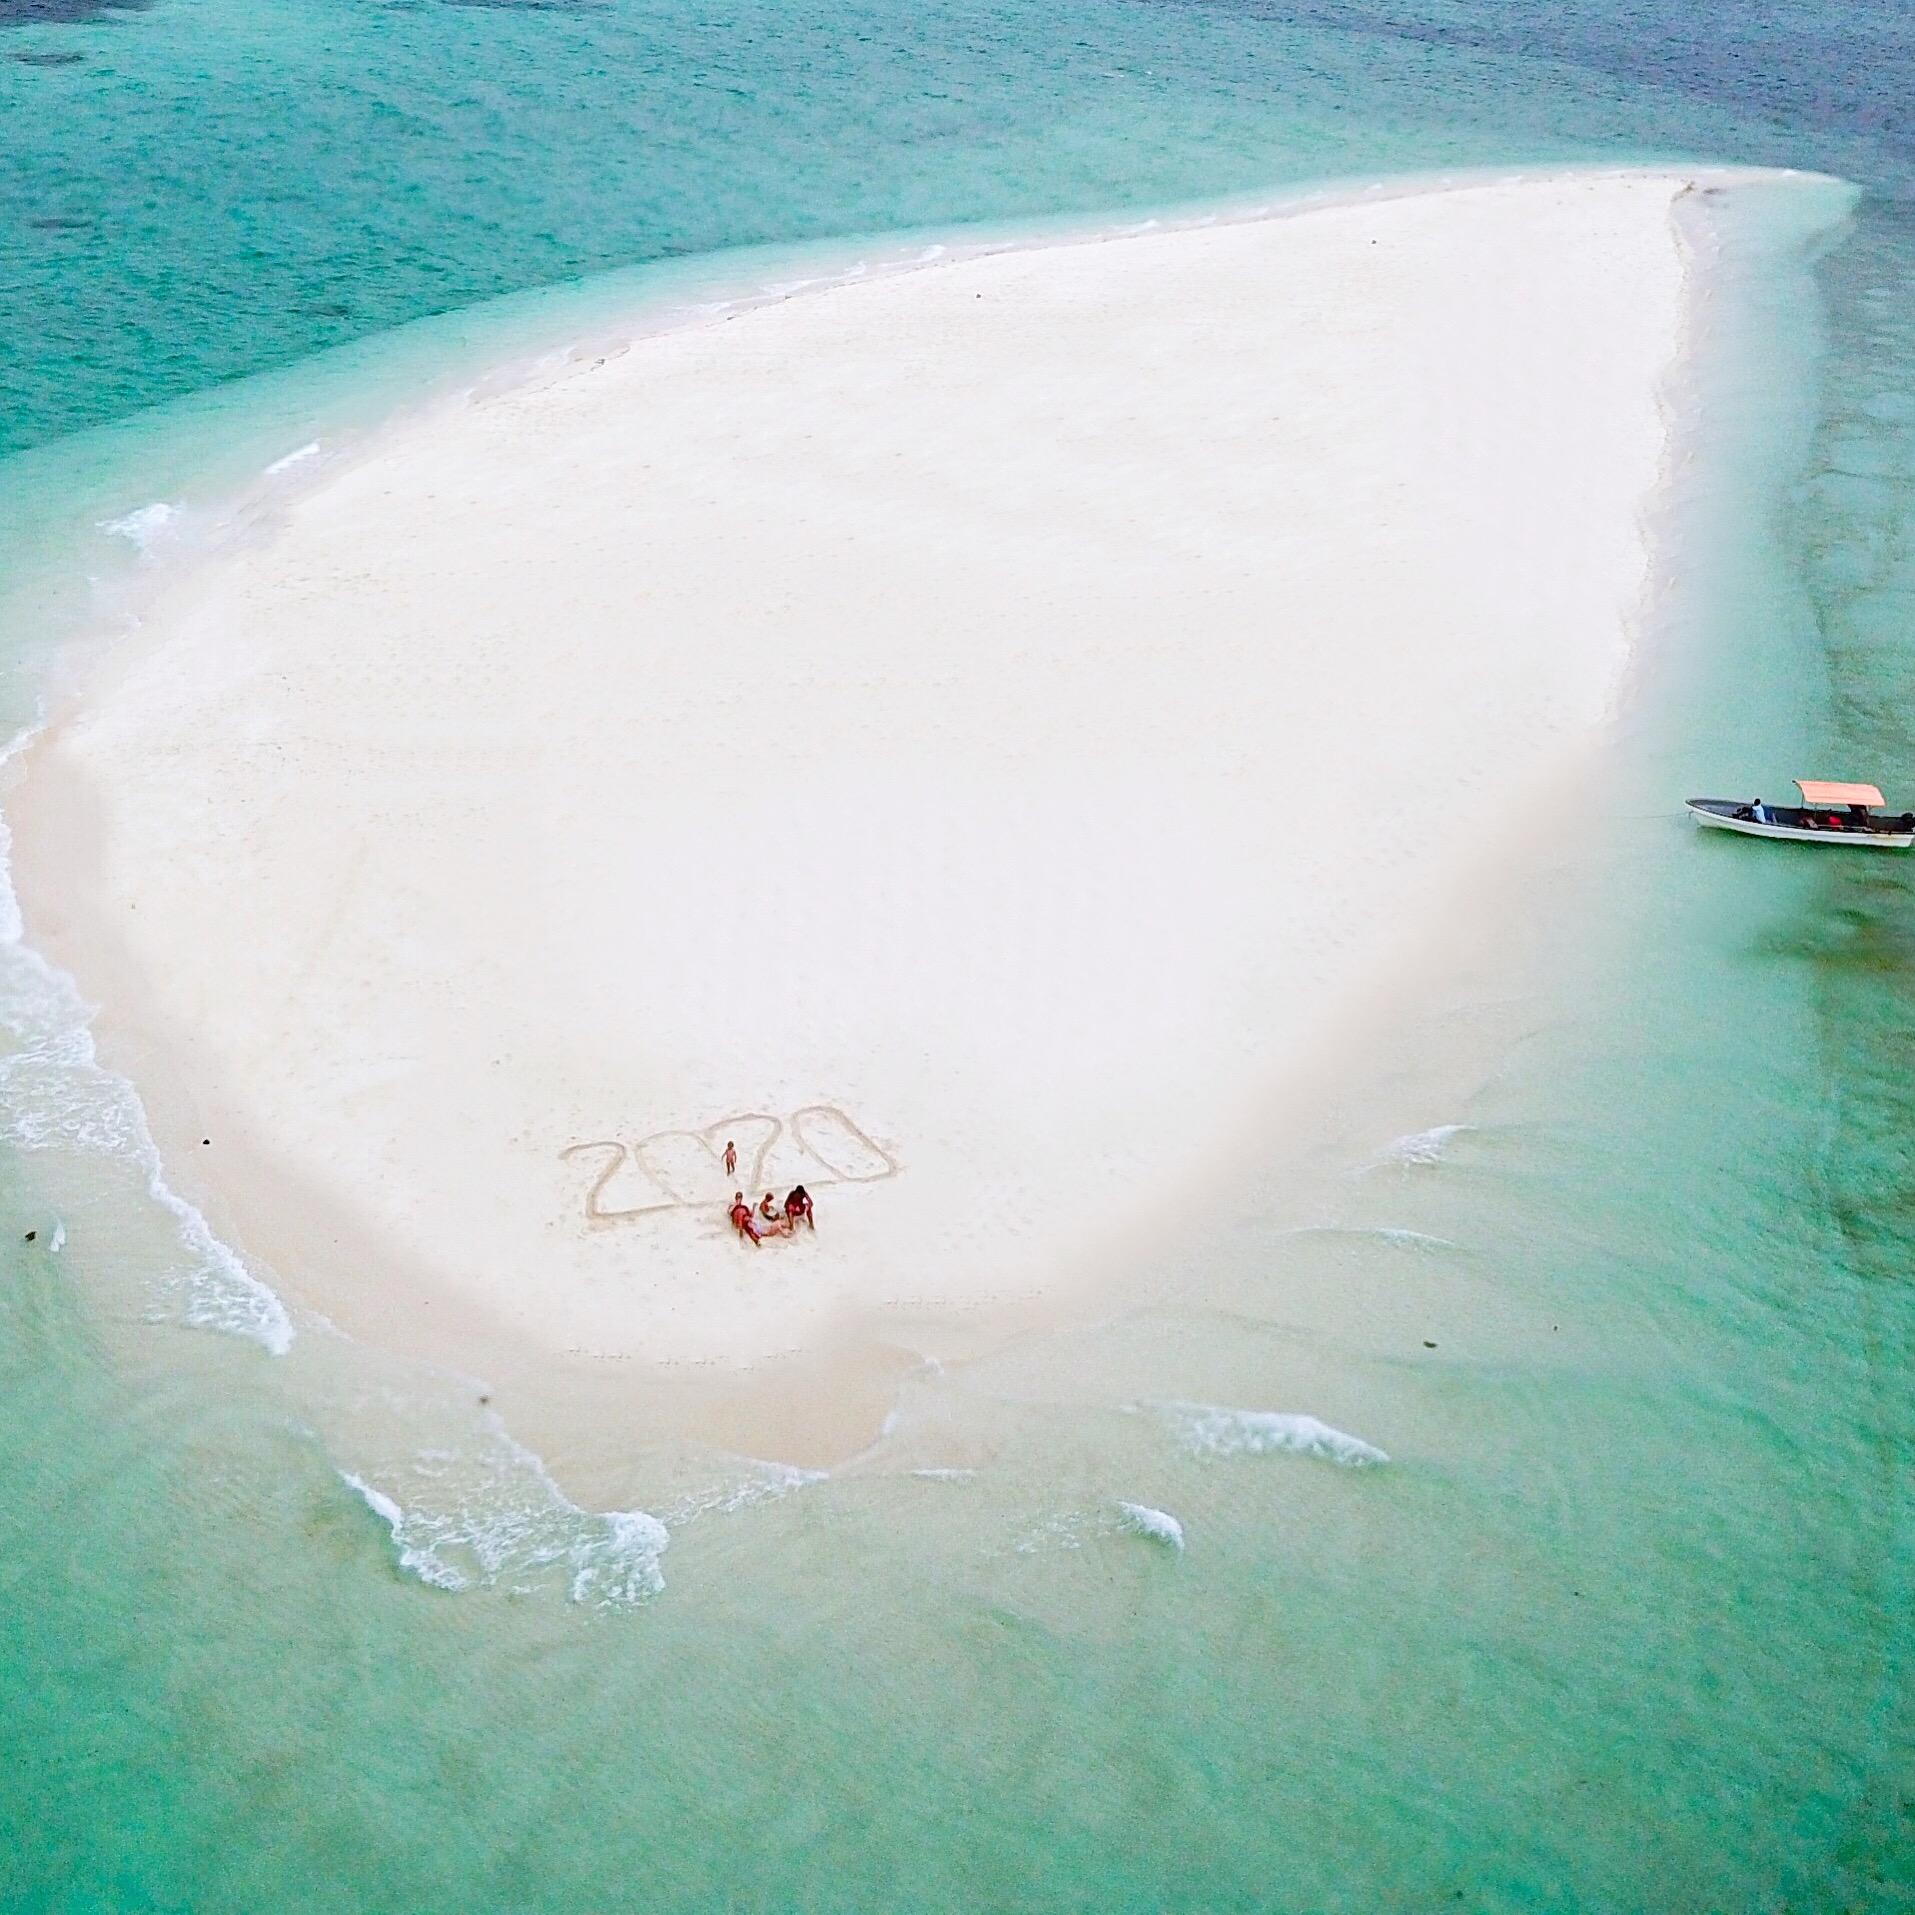 ilha de Zanzibar o que fazer em Zanzibar Blue safari zanzibar pungume